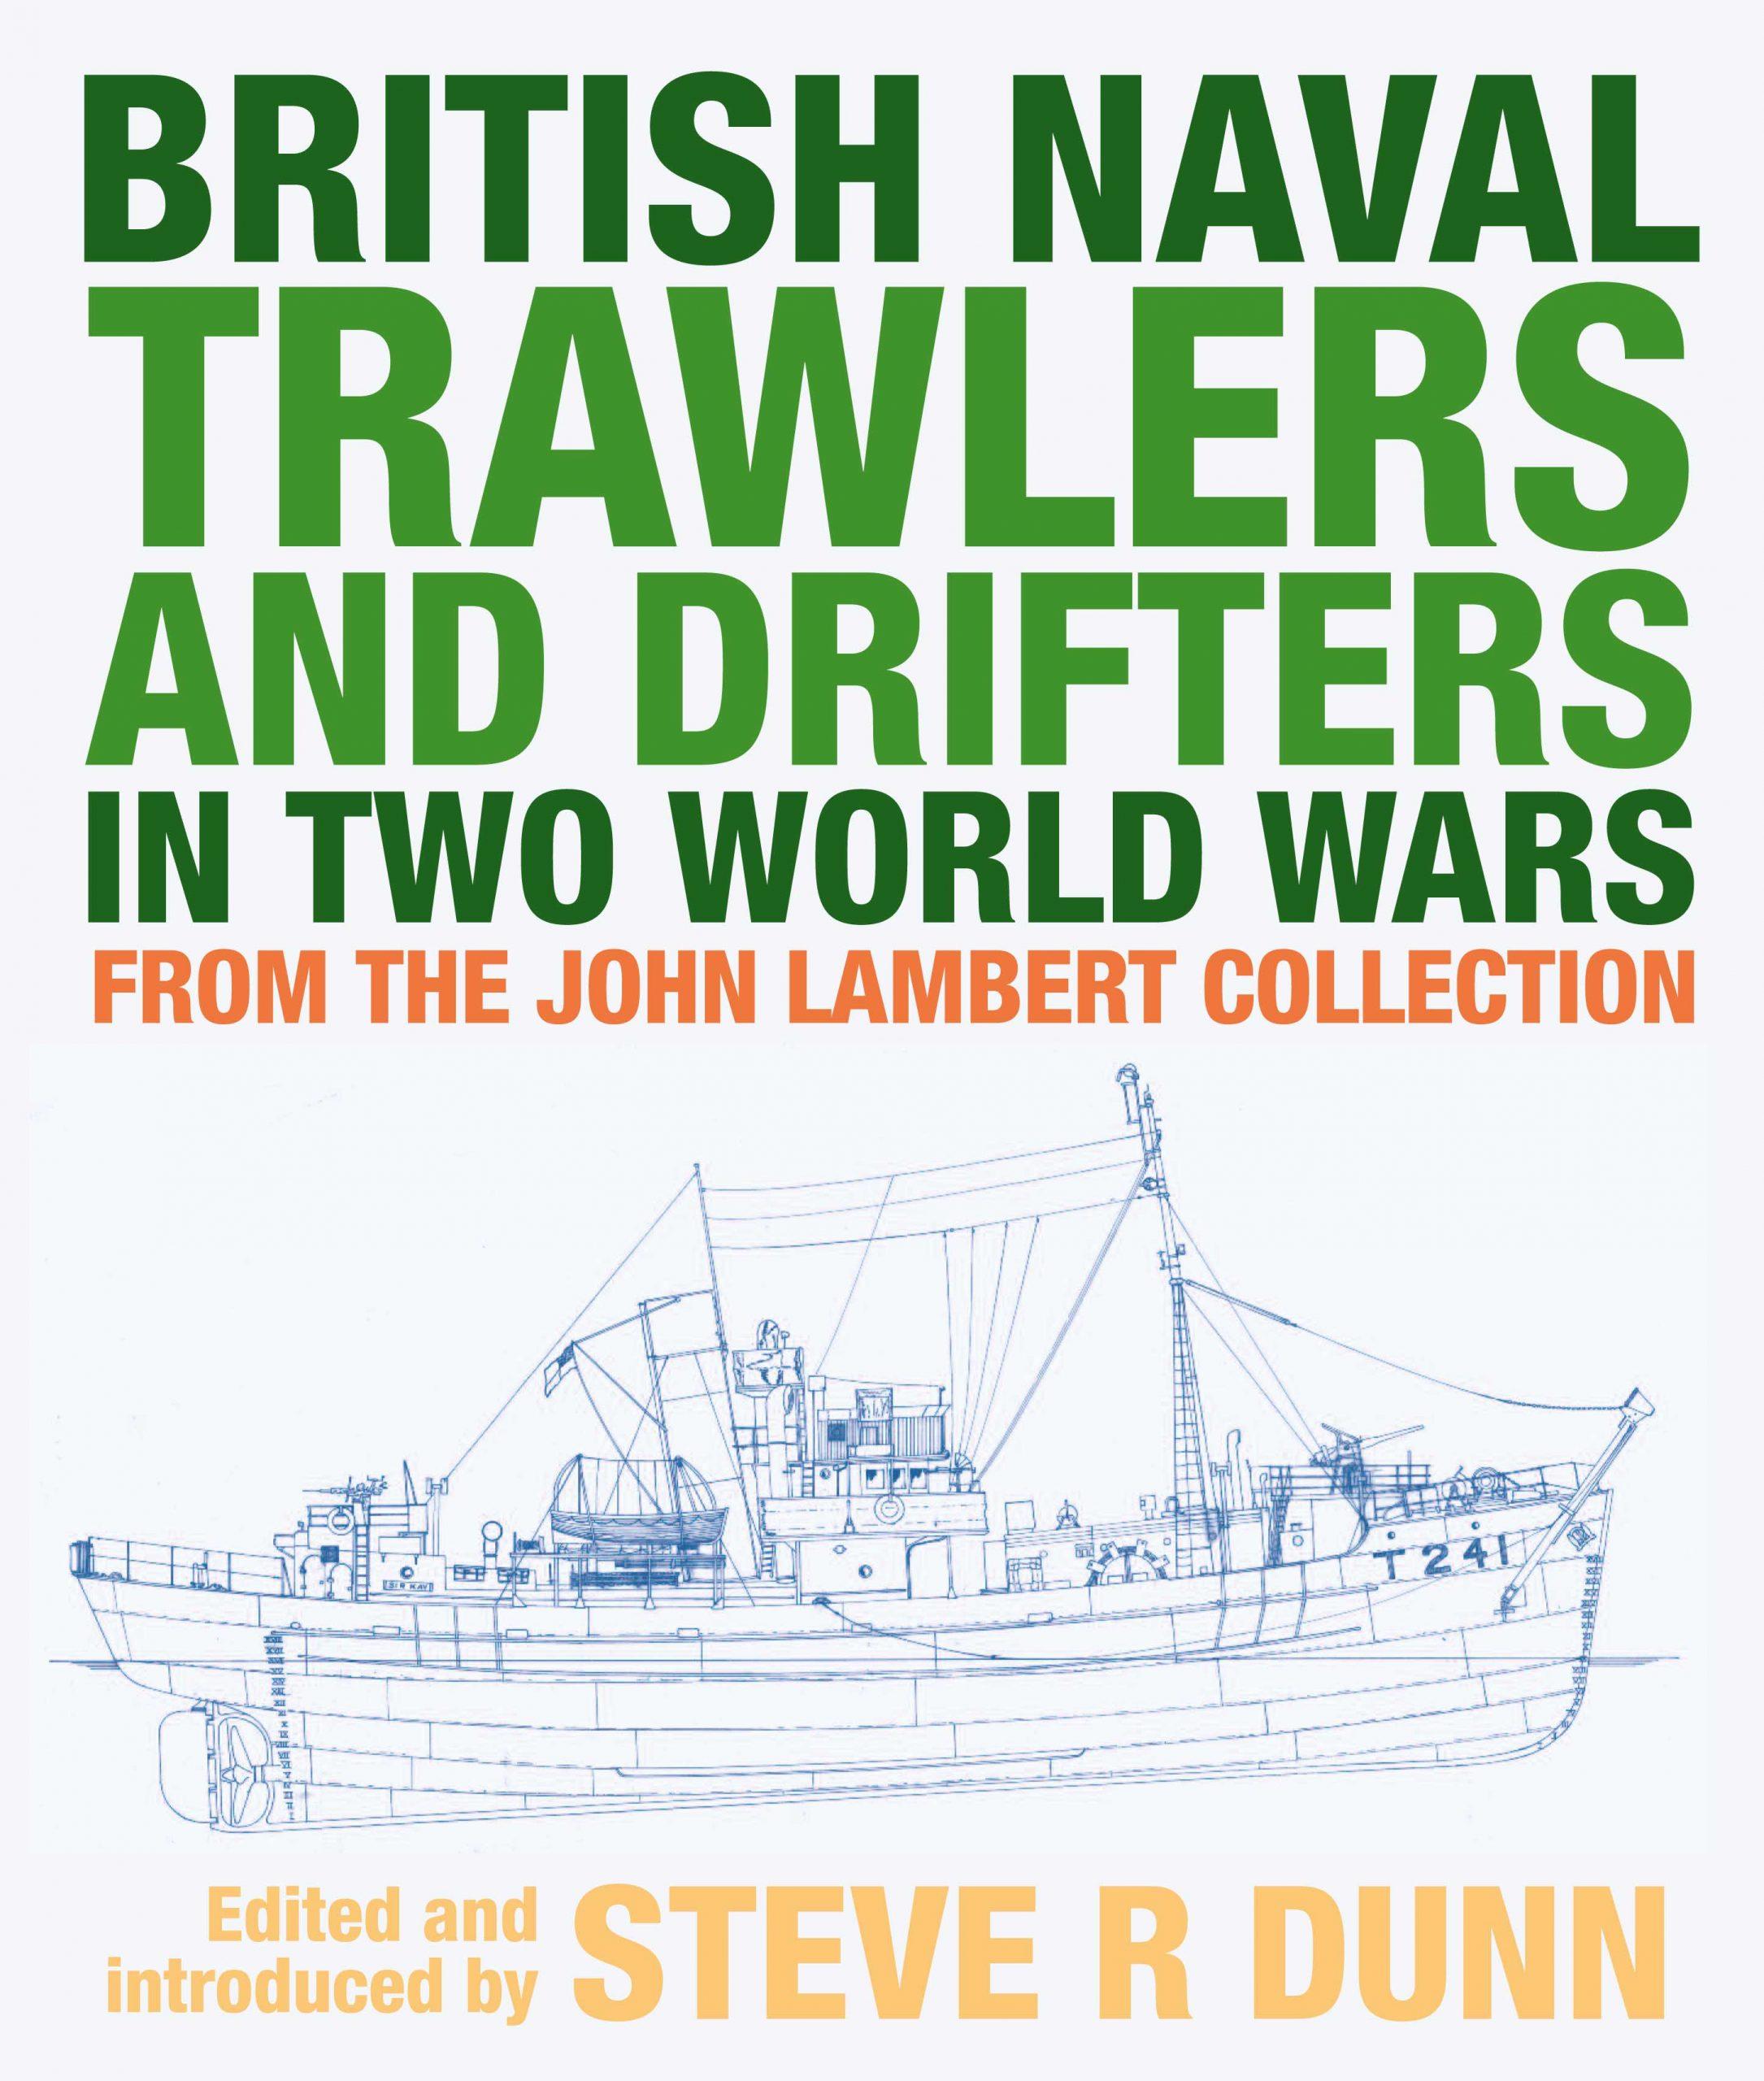 British Naval Trawlers Book Cover